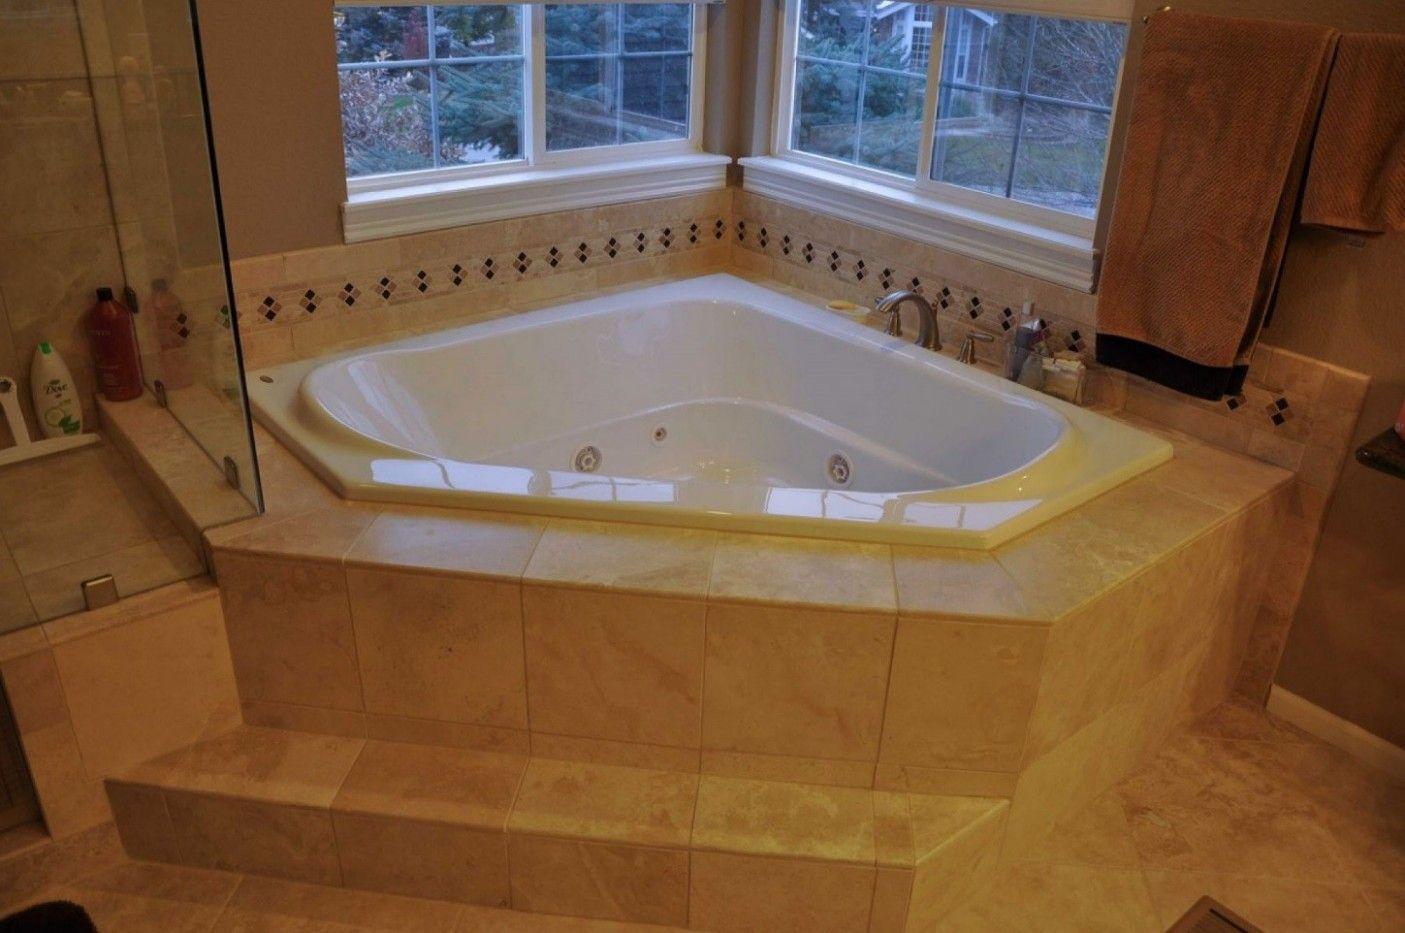 Small Bathroom Ideas With Jacuzzi Tub Bathroom Jacuzzi Tub Ideas Jacuzzi Bathtub Bathtub Remodel